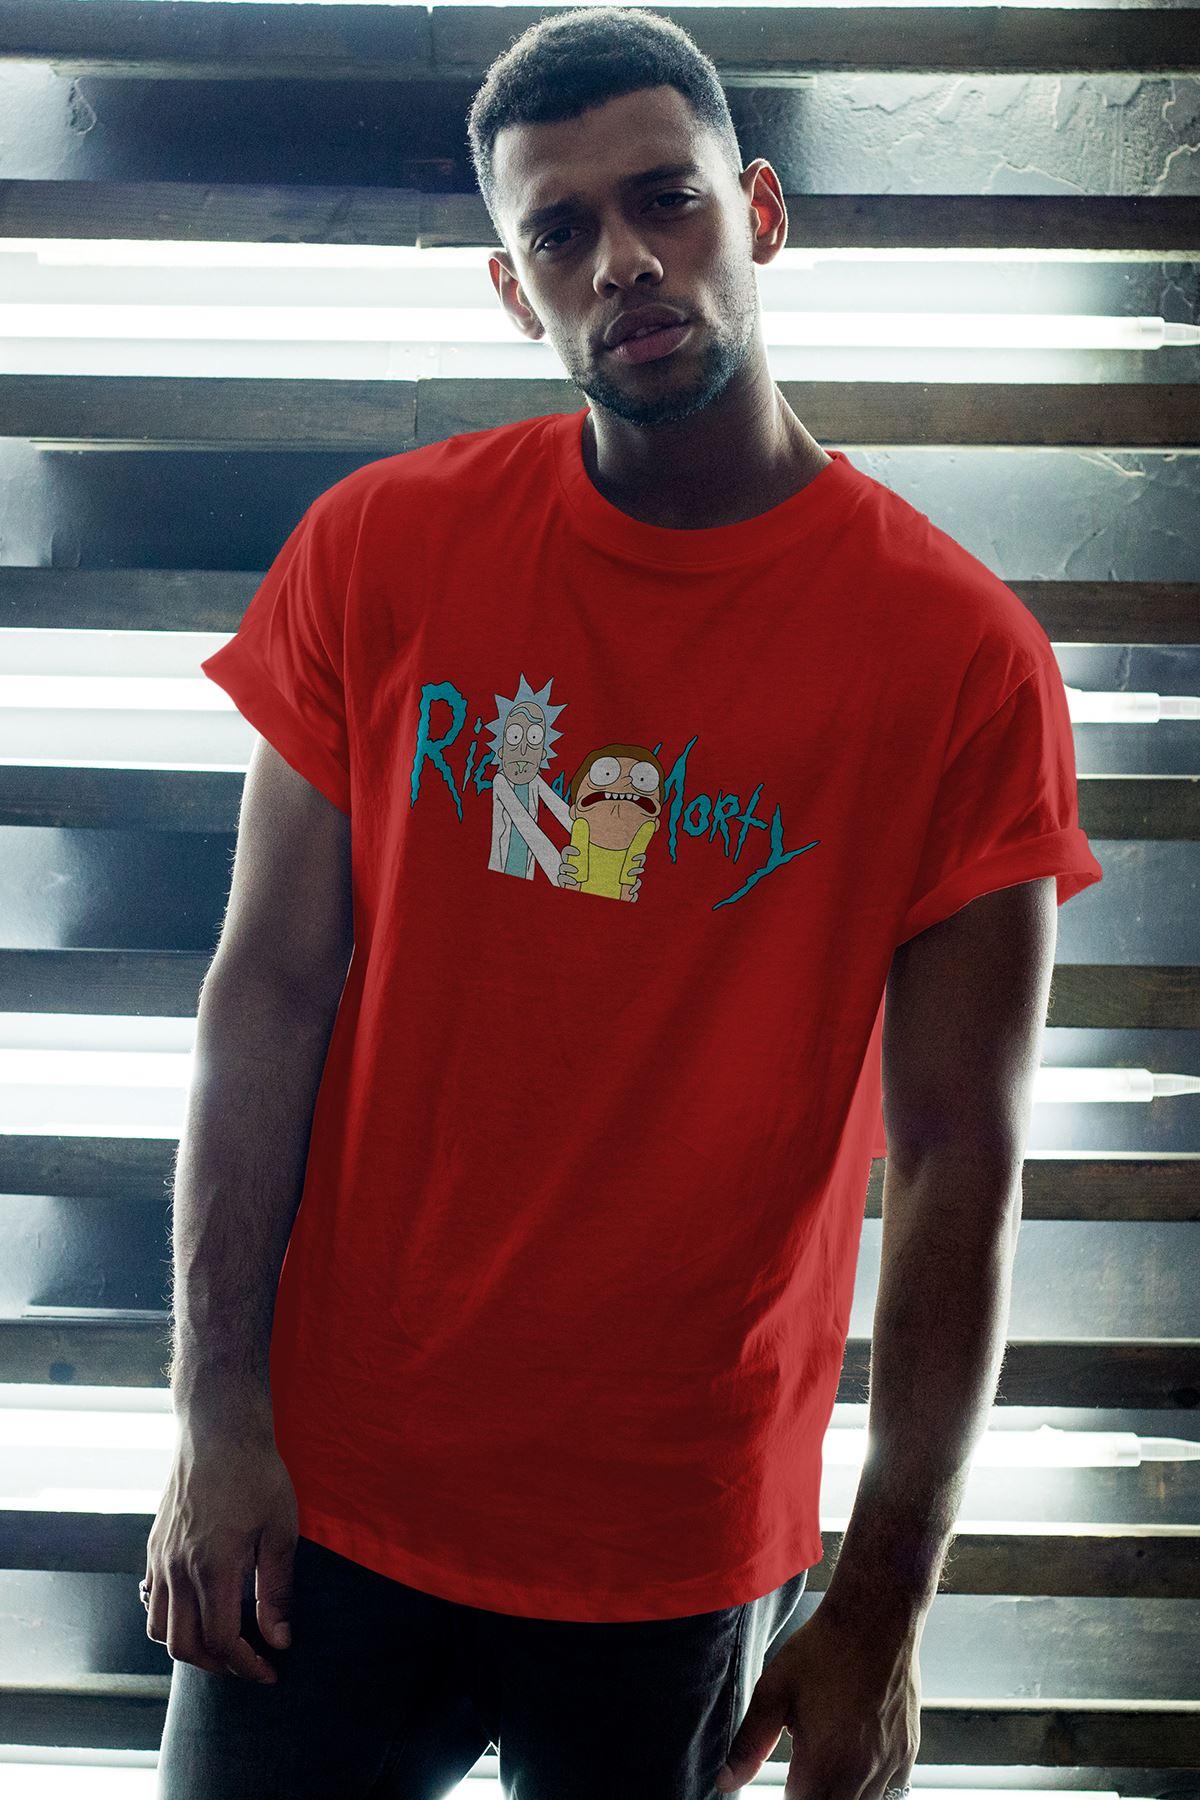 Rick And Morty 01 Kırmızı Erkek Oversize Tshirt - Tişört